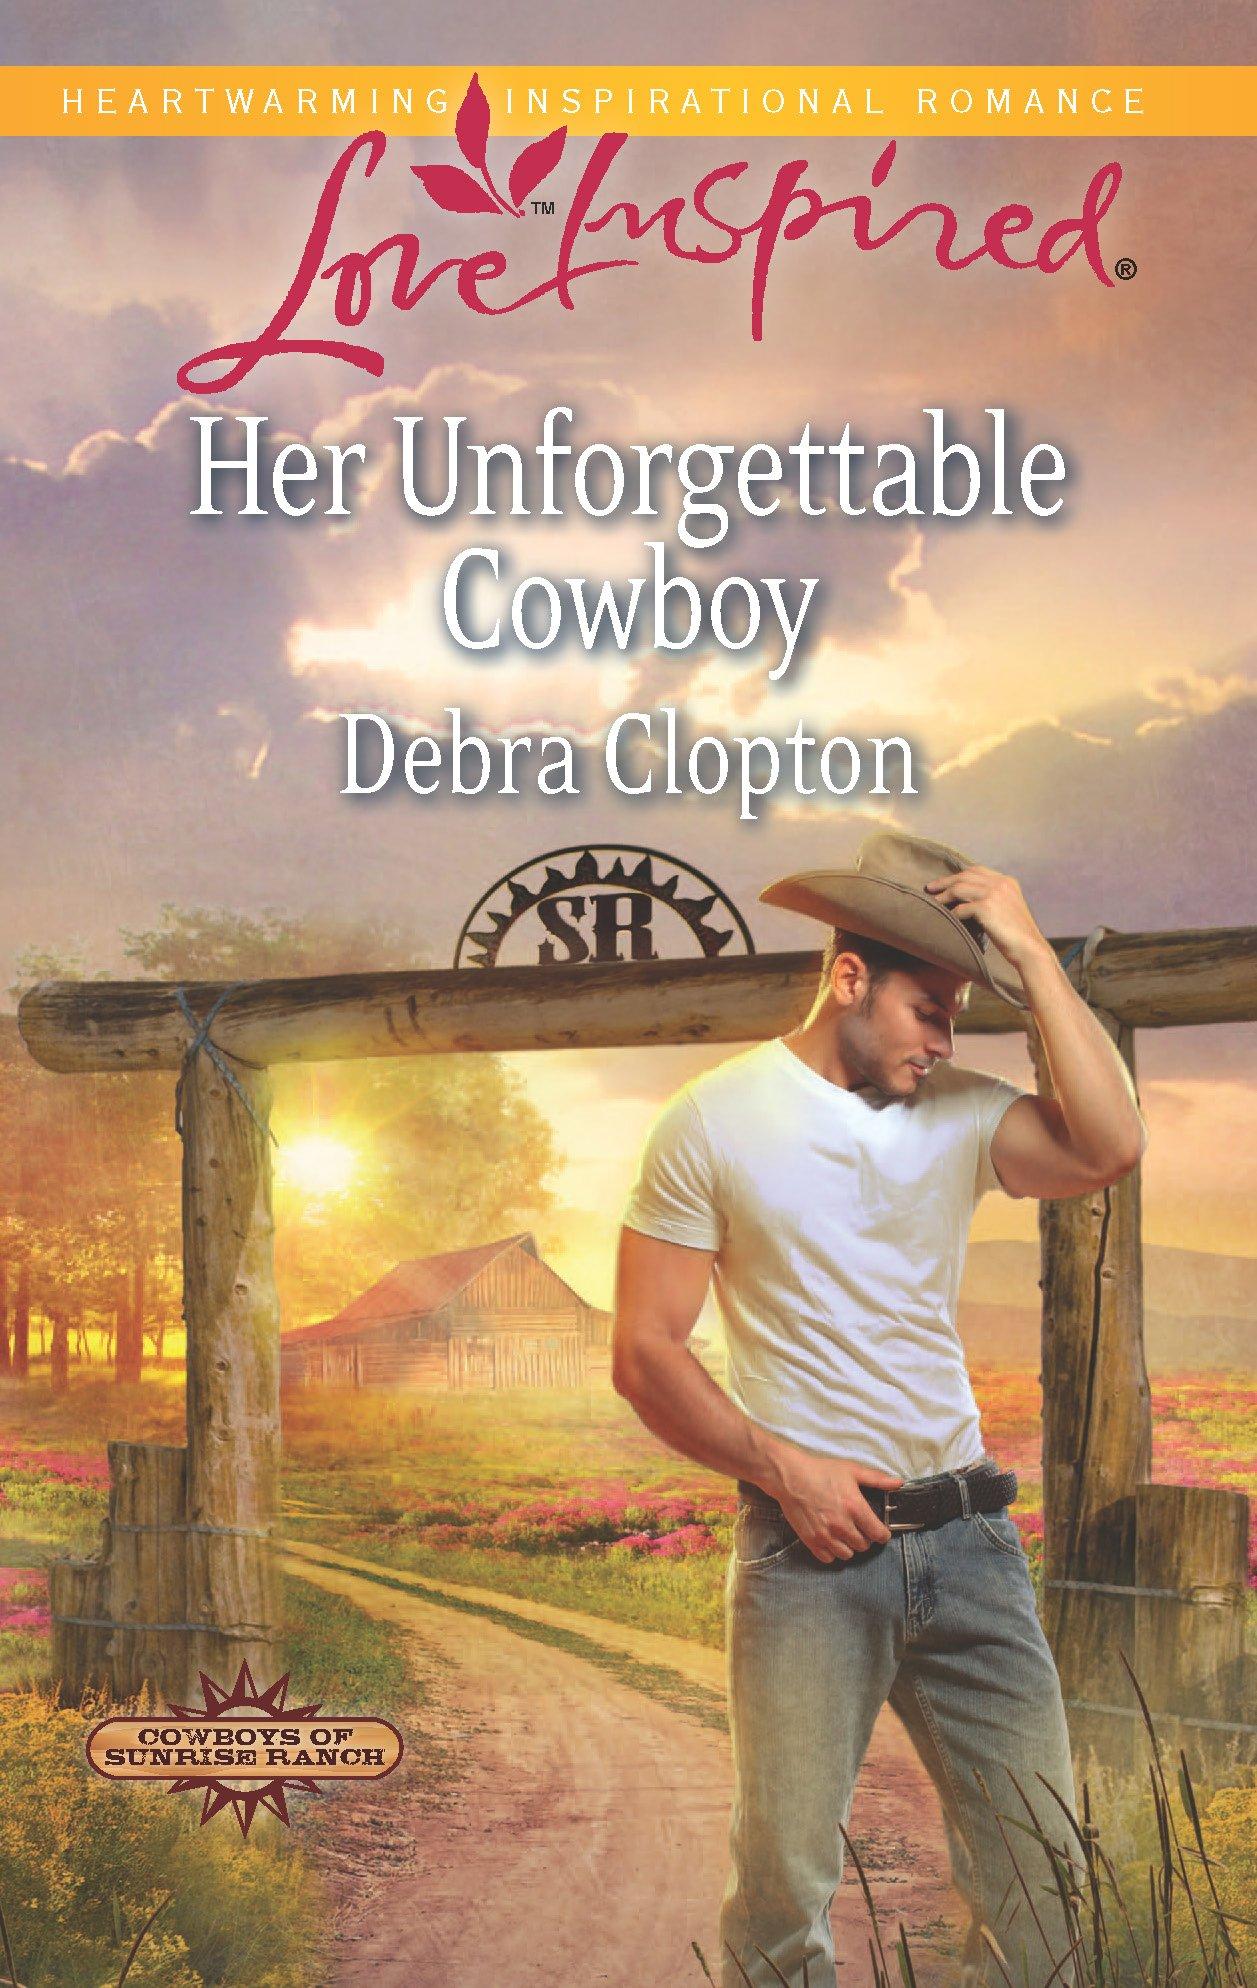 Her Unforgettable Cowboy (Cowboys of Sunrise Ranch): Debra Clopton:  9780373878116: Amazon.com: Books